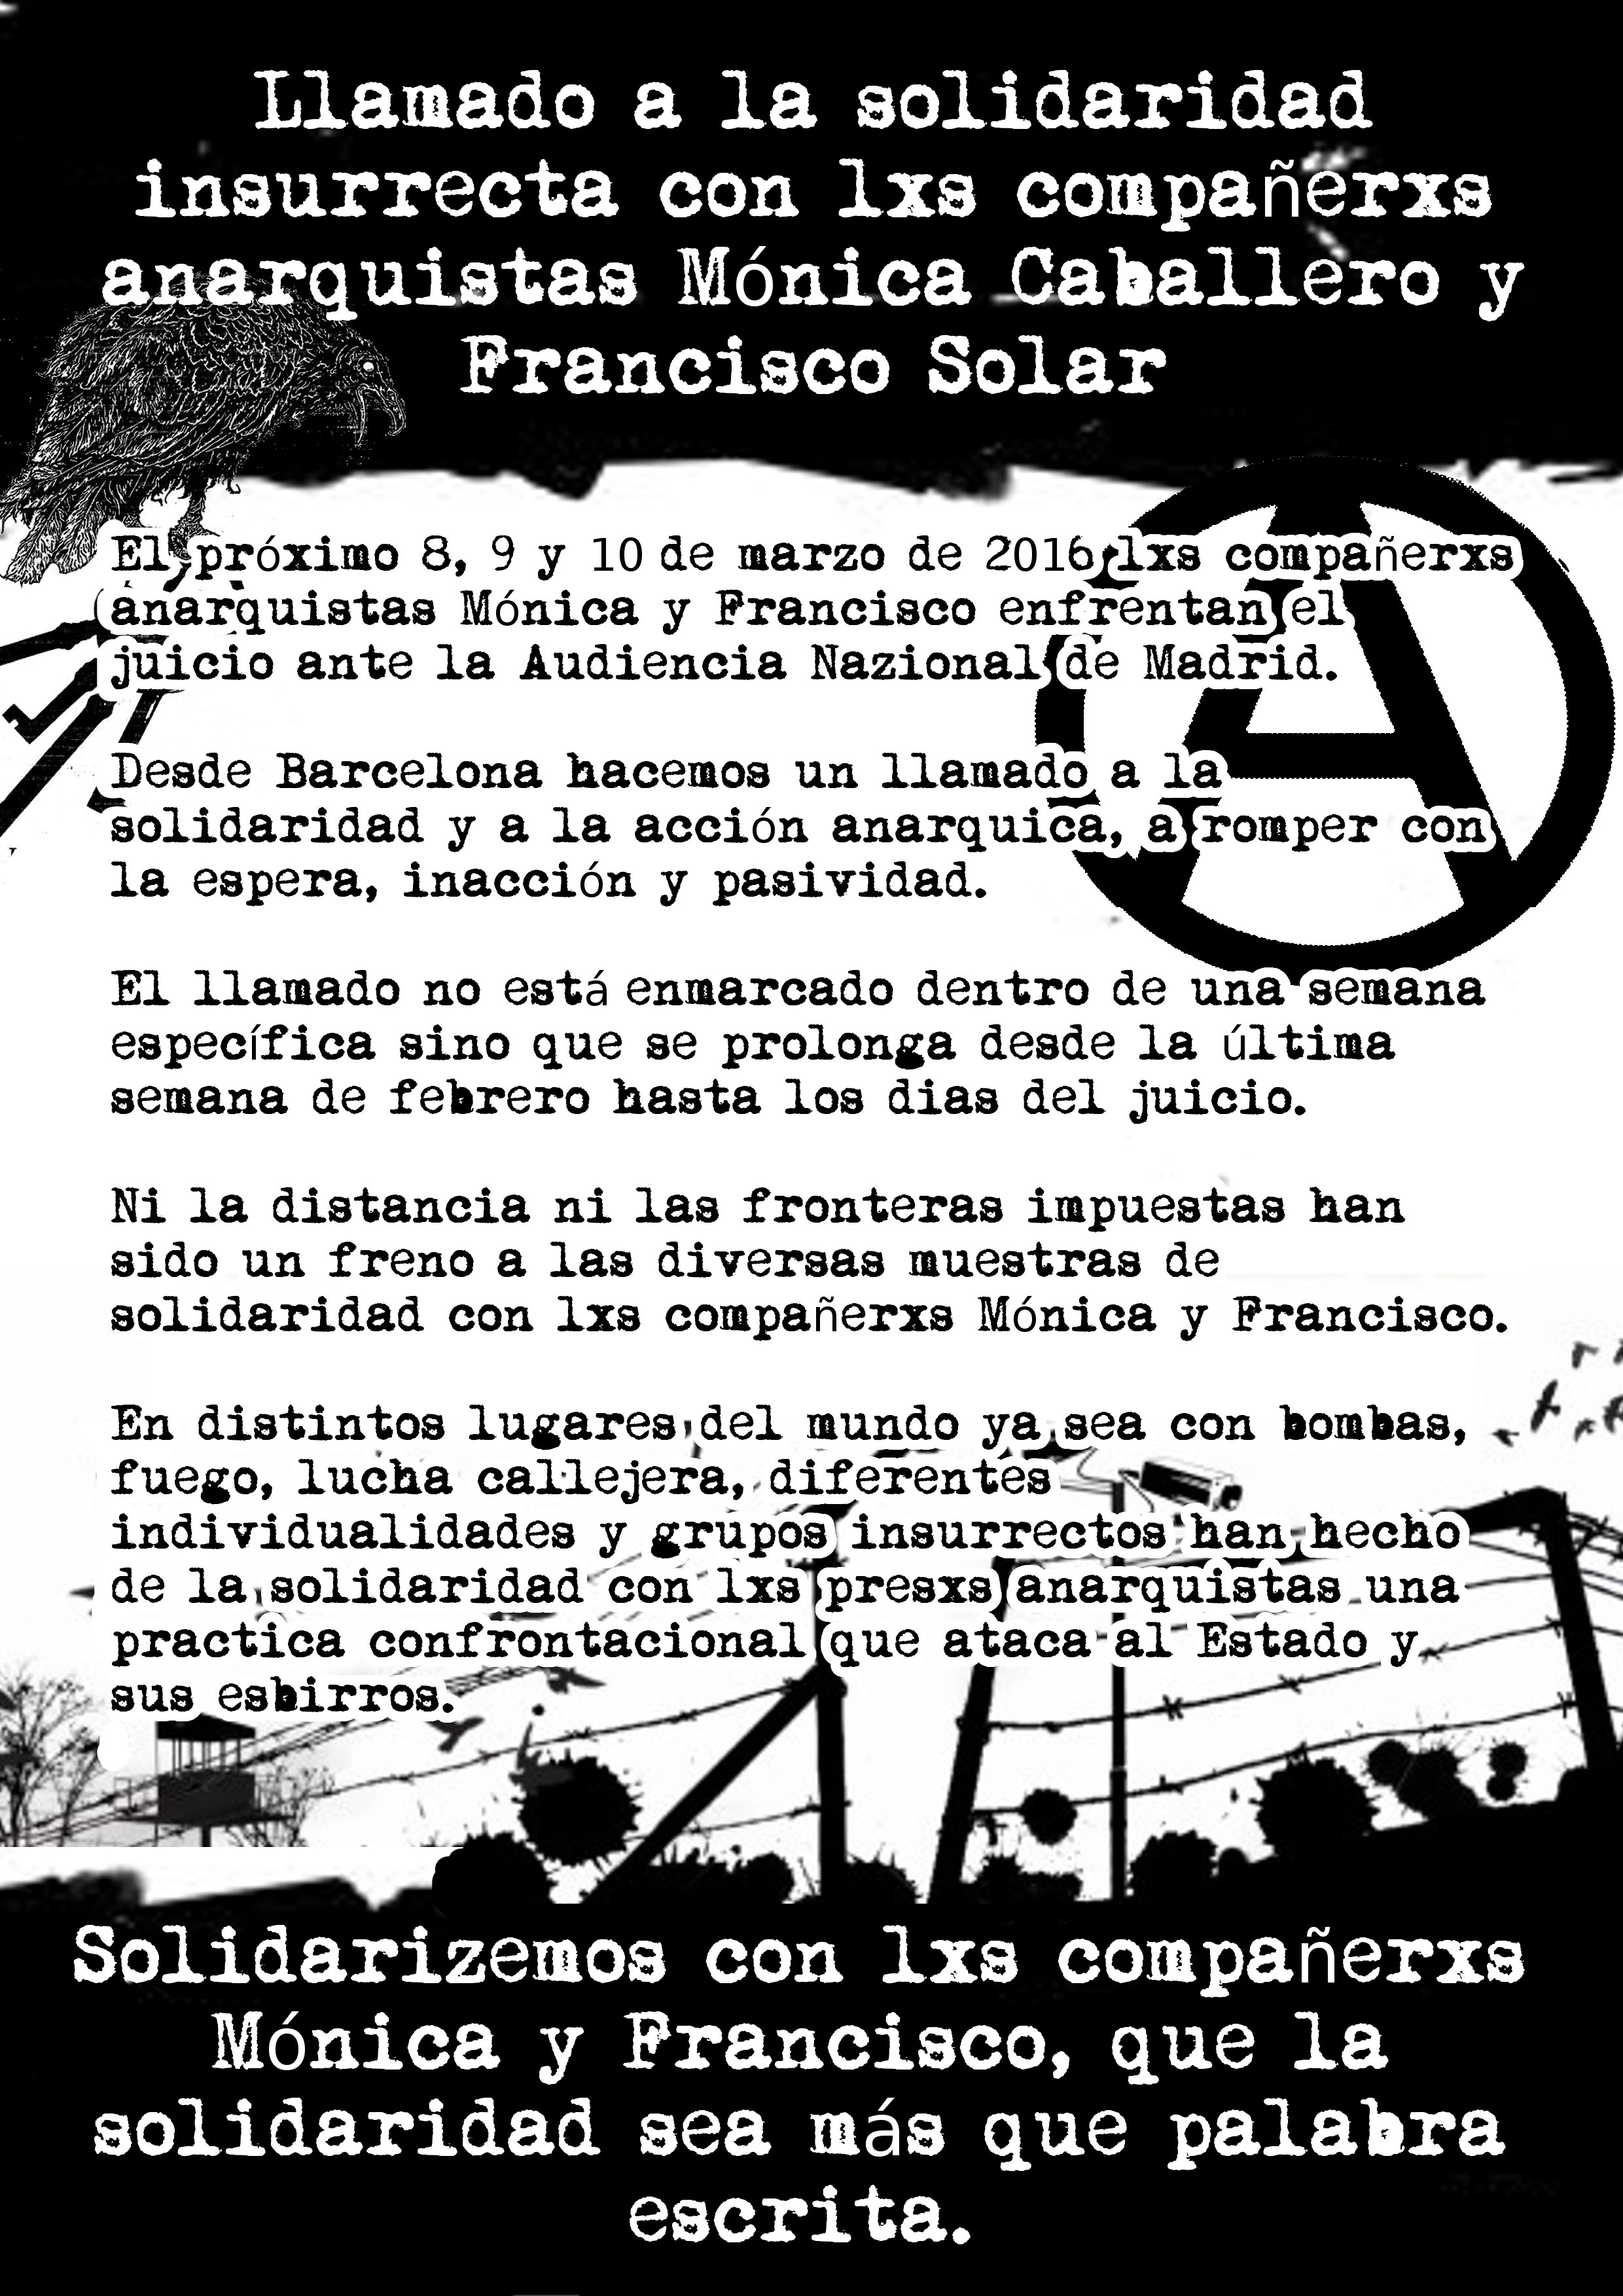 Solidaridad insurrecta MF